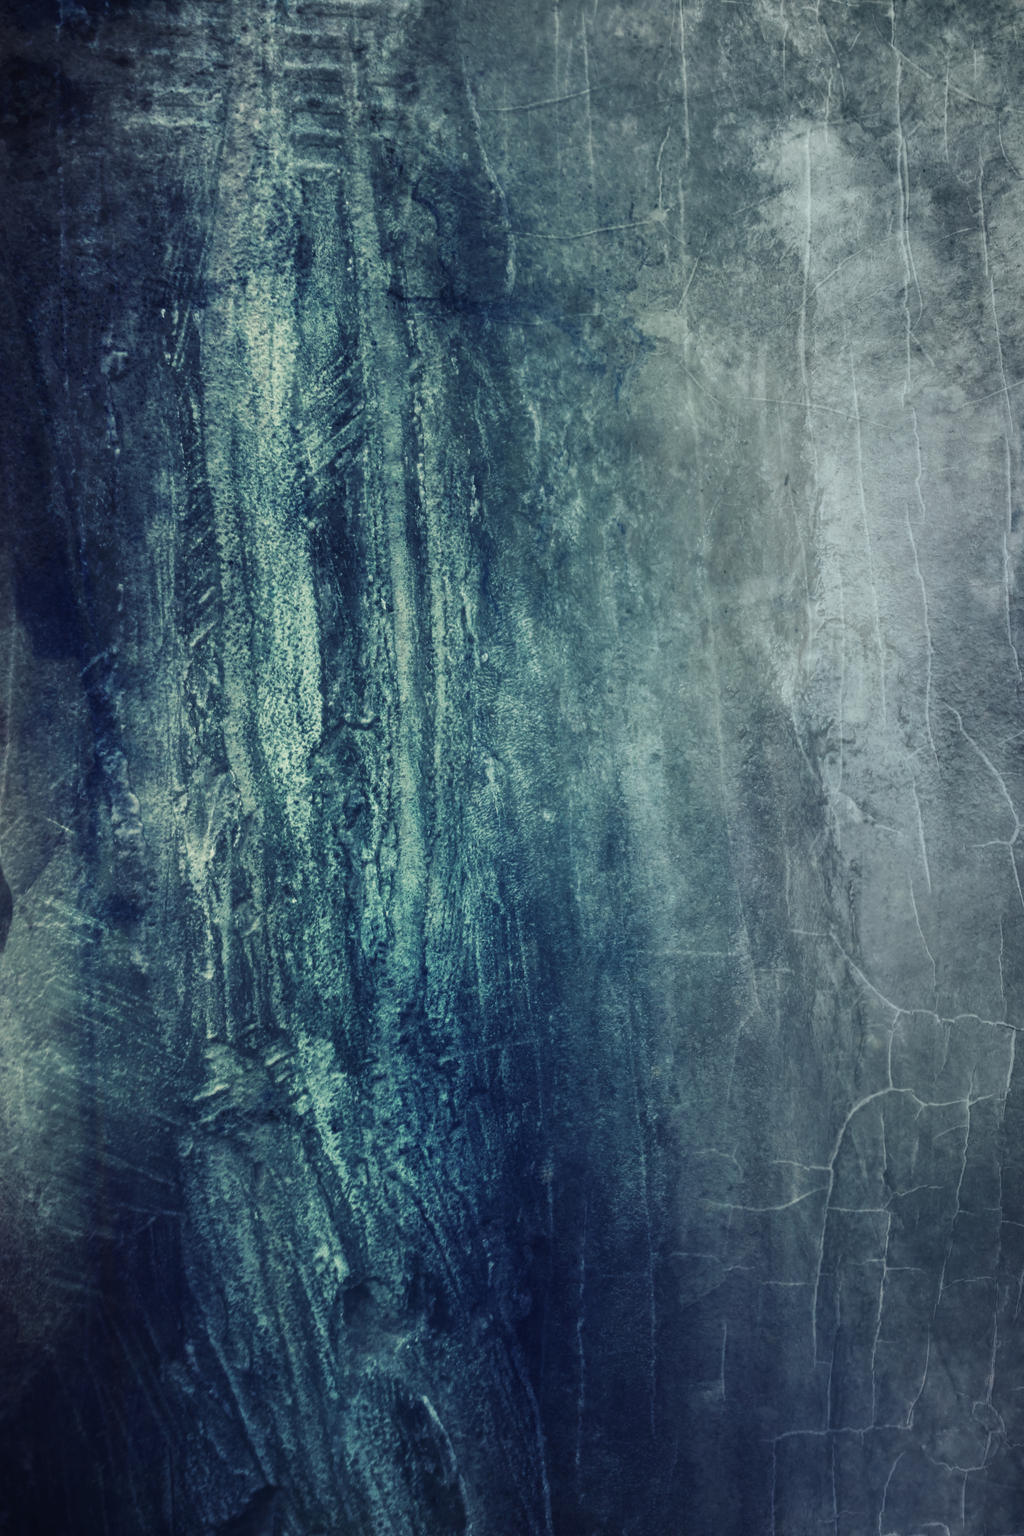 Digital Art Texture 164